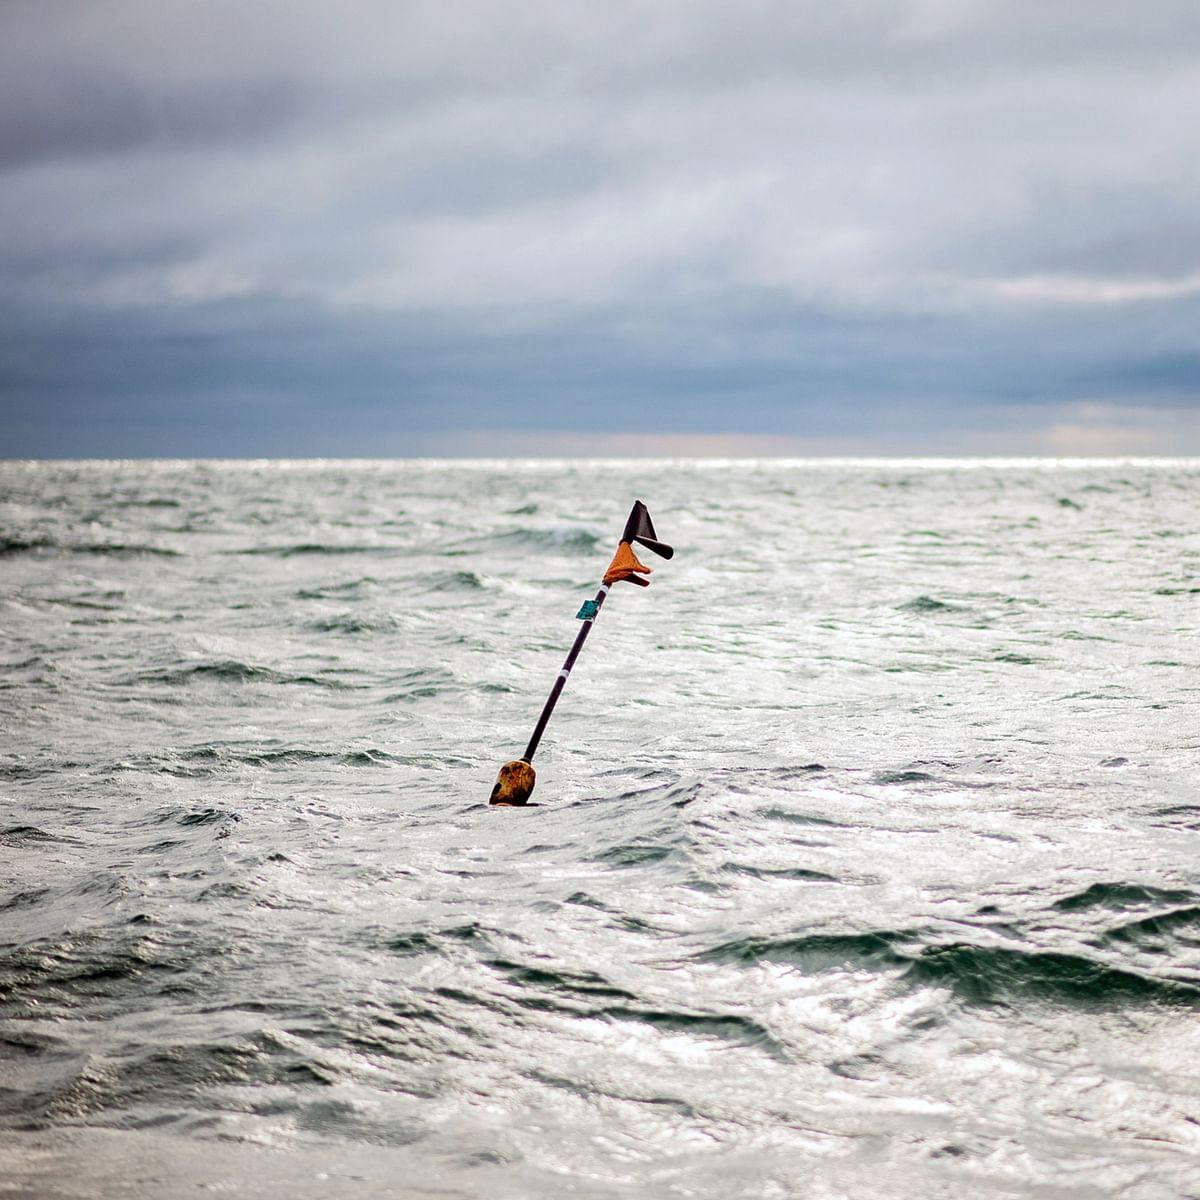 Thinkpad: That Sinking Feeling...